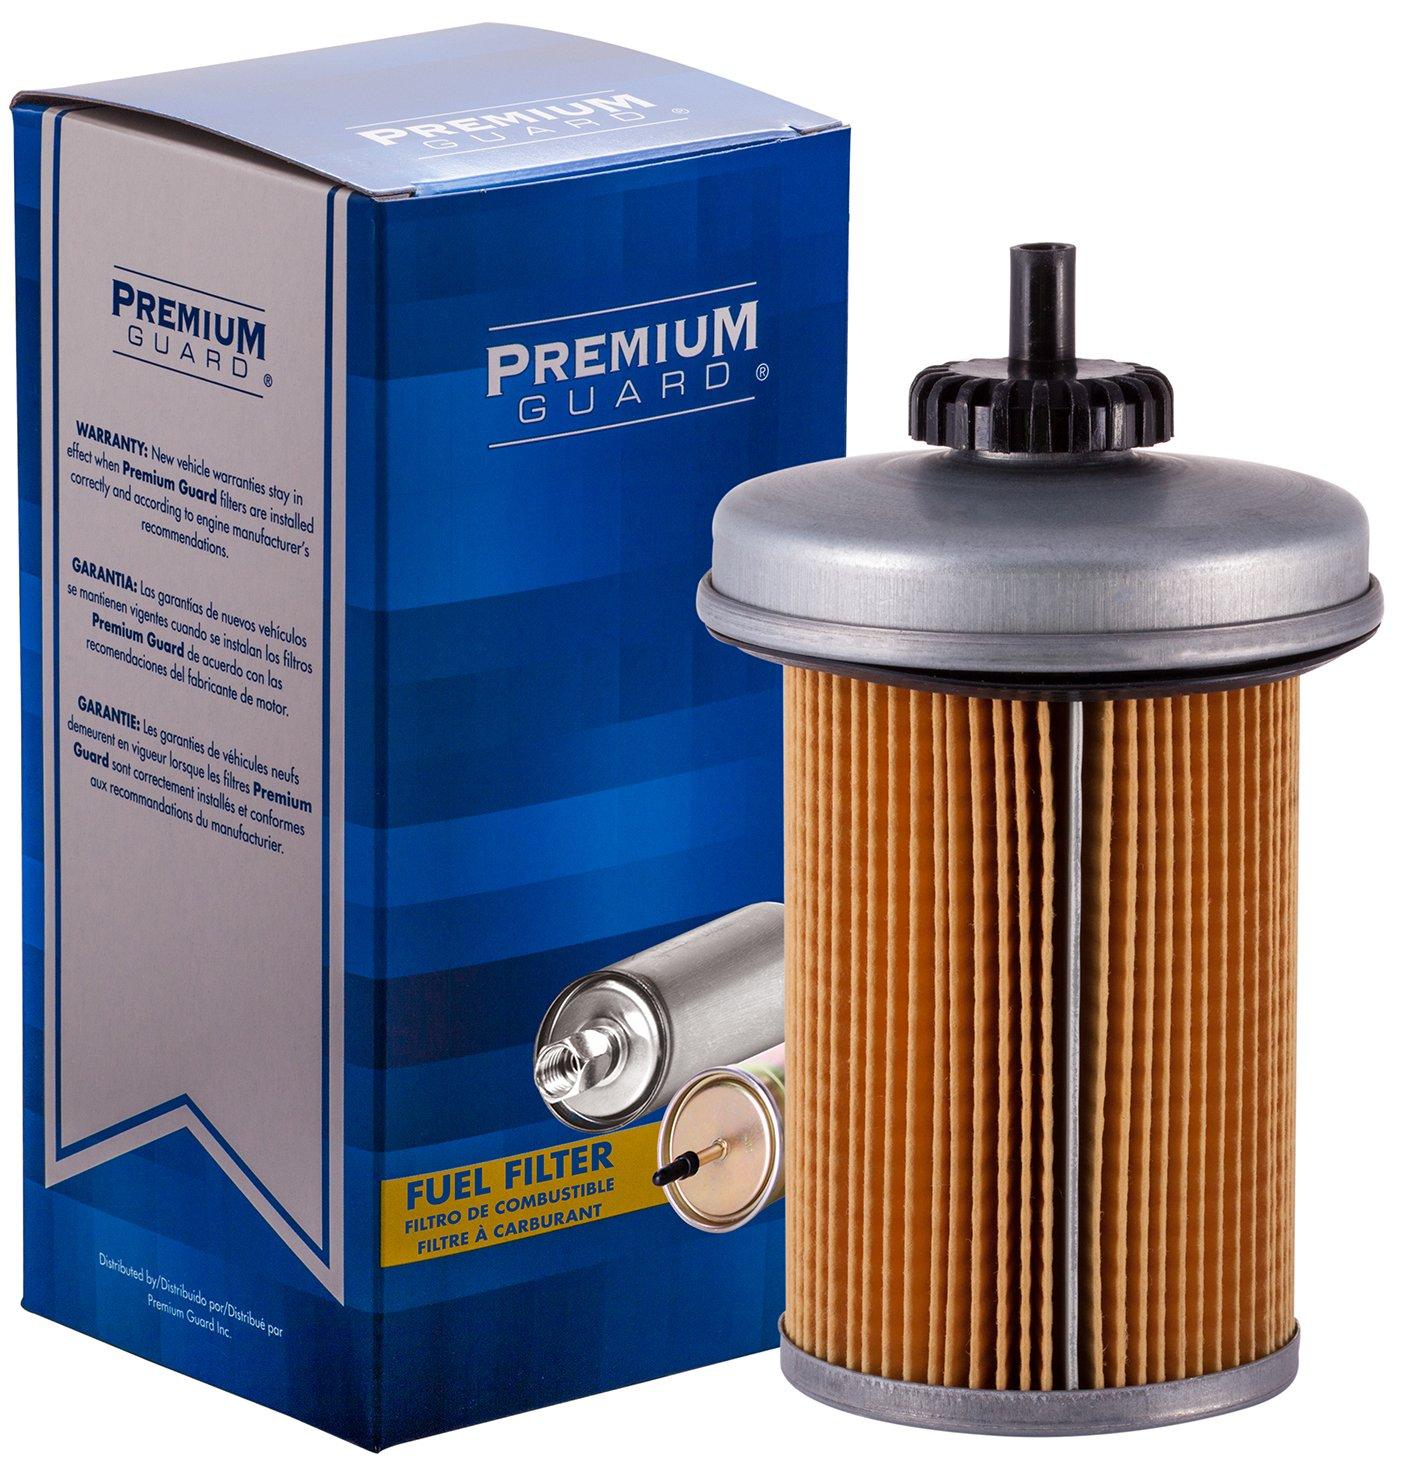 Amazon.com: Premium Guard Diesel Fuel Filter DF7358 | Fits 1995 GMC C1500,  1995 GMC K1500: Automotive